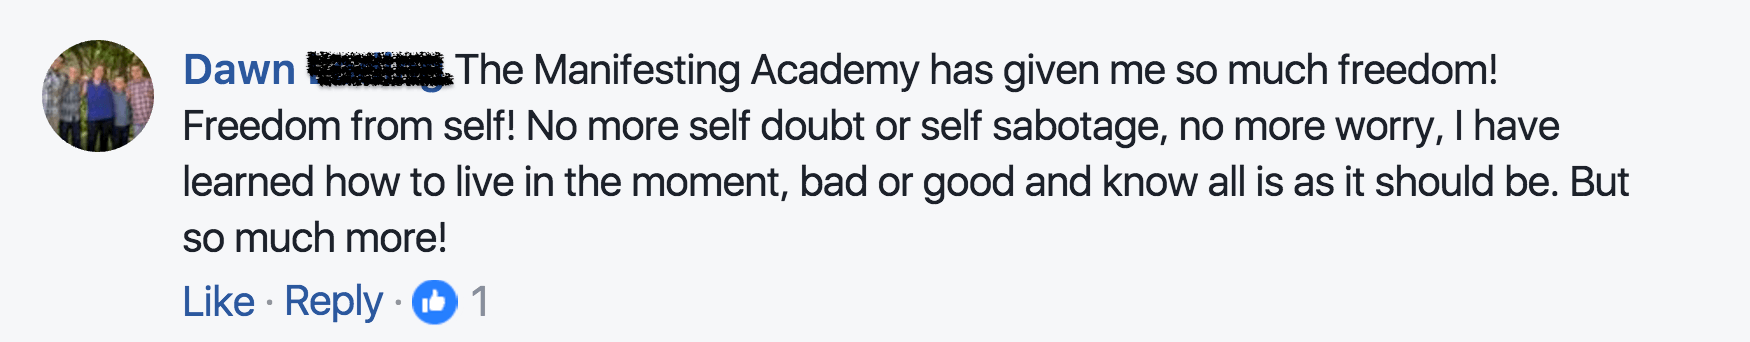 The Manifesting Academy